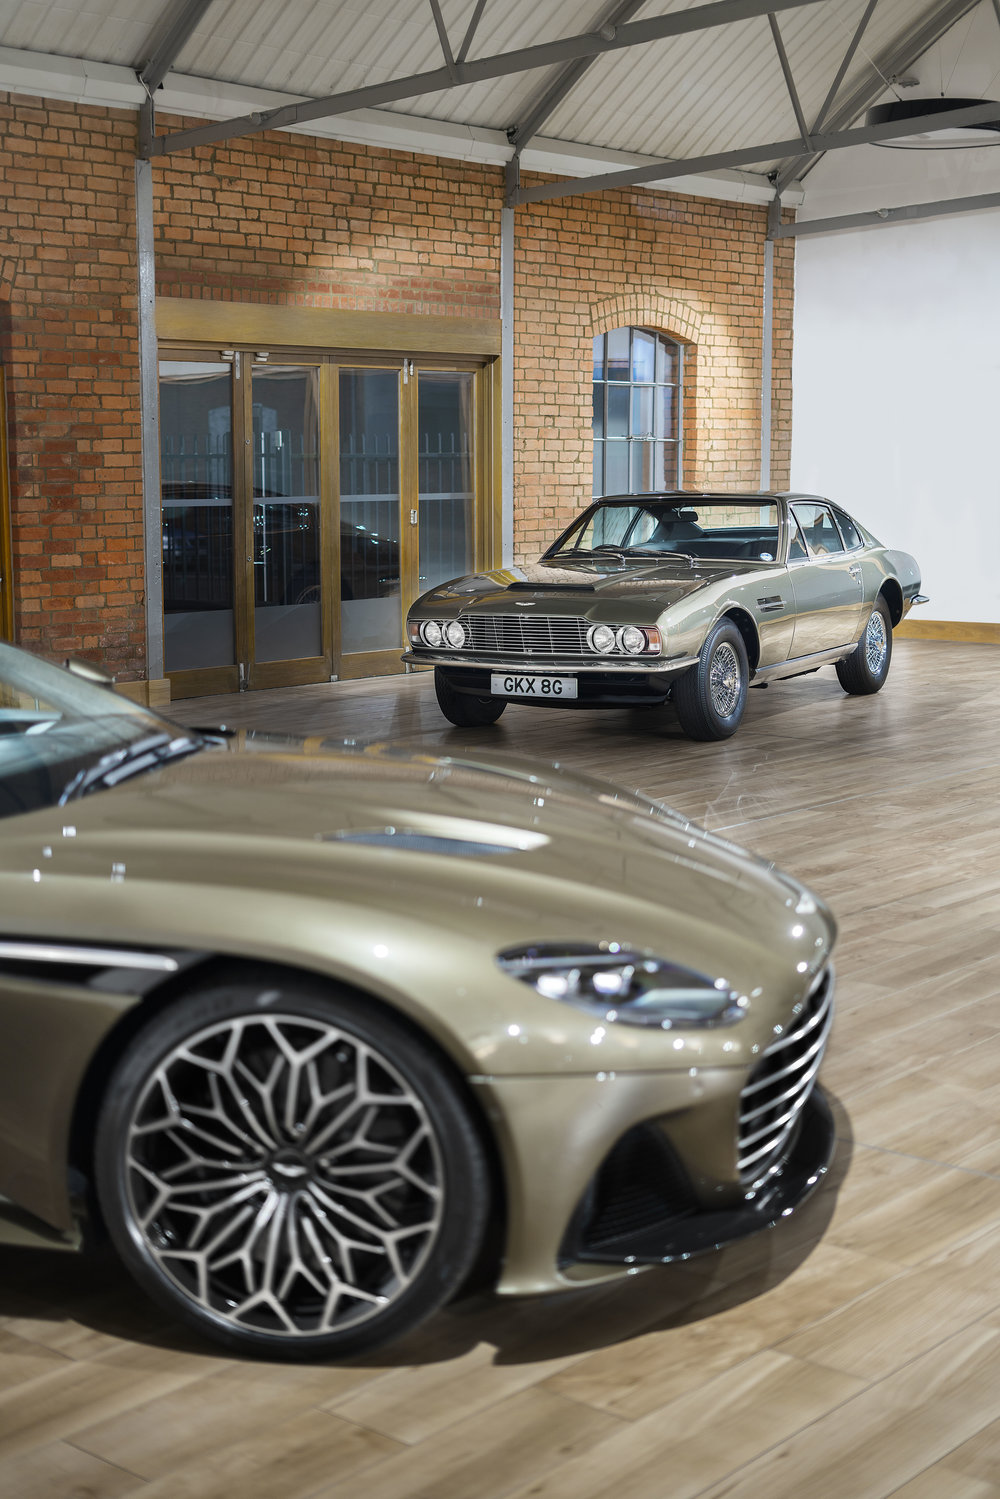 Aston Martin Dbs Superleggera Set To Become The New James